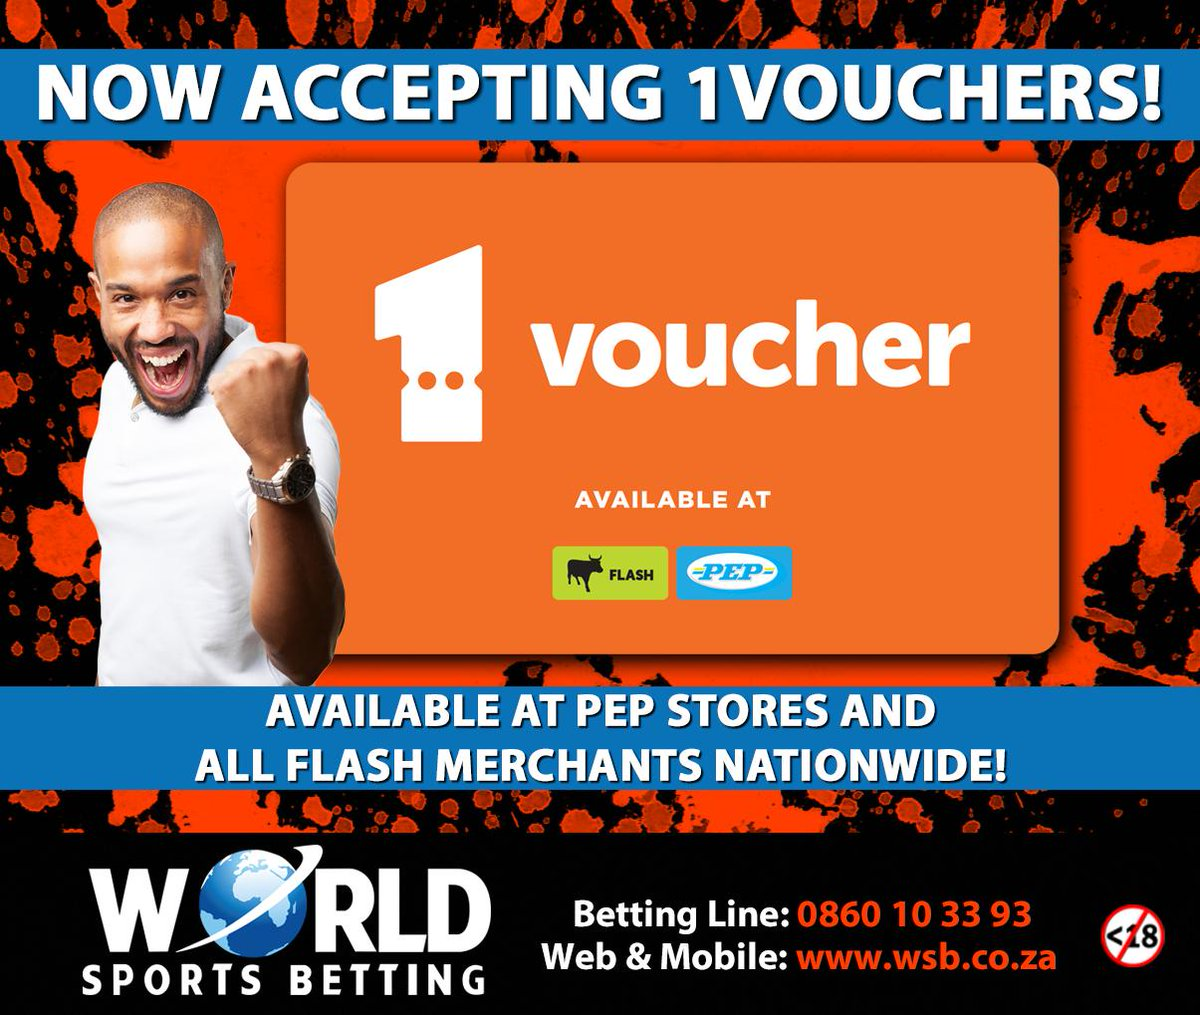 World sports betting vouchers online betting nfl legal department